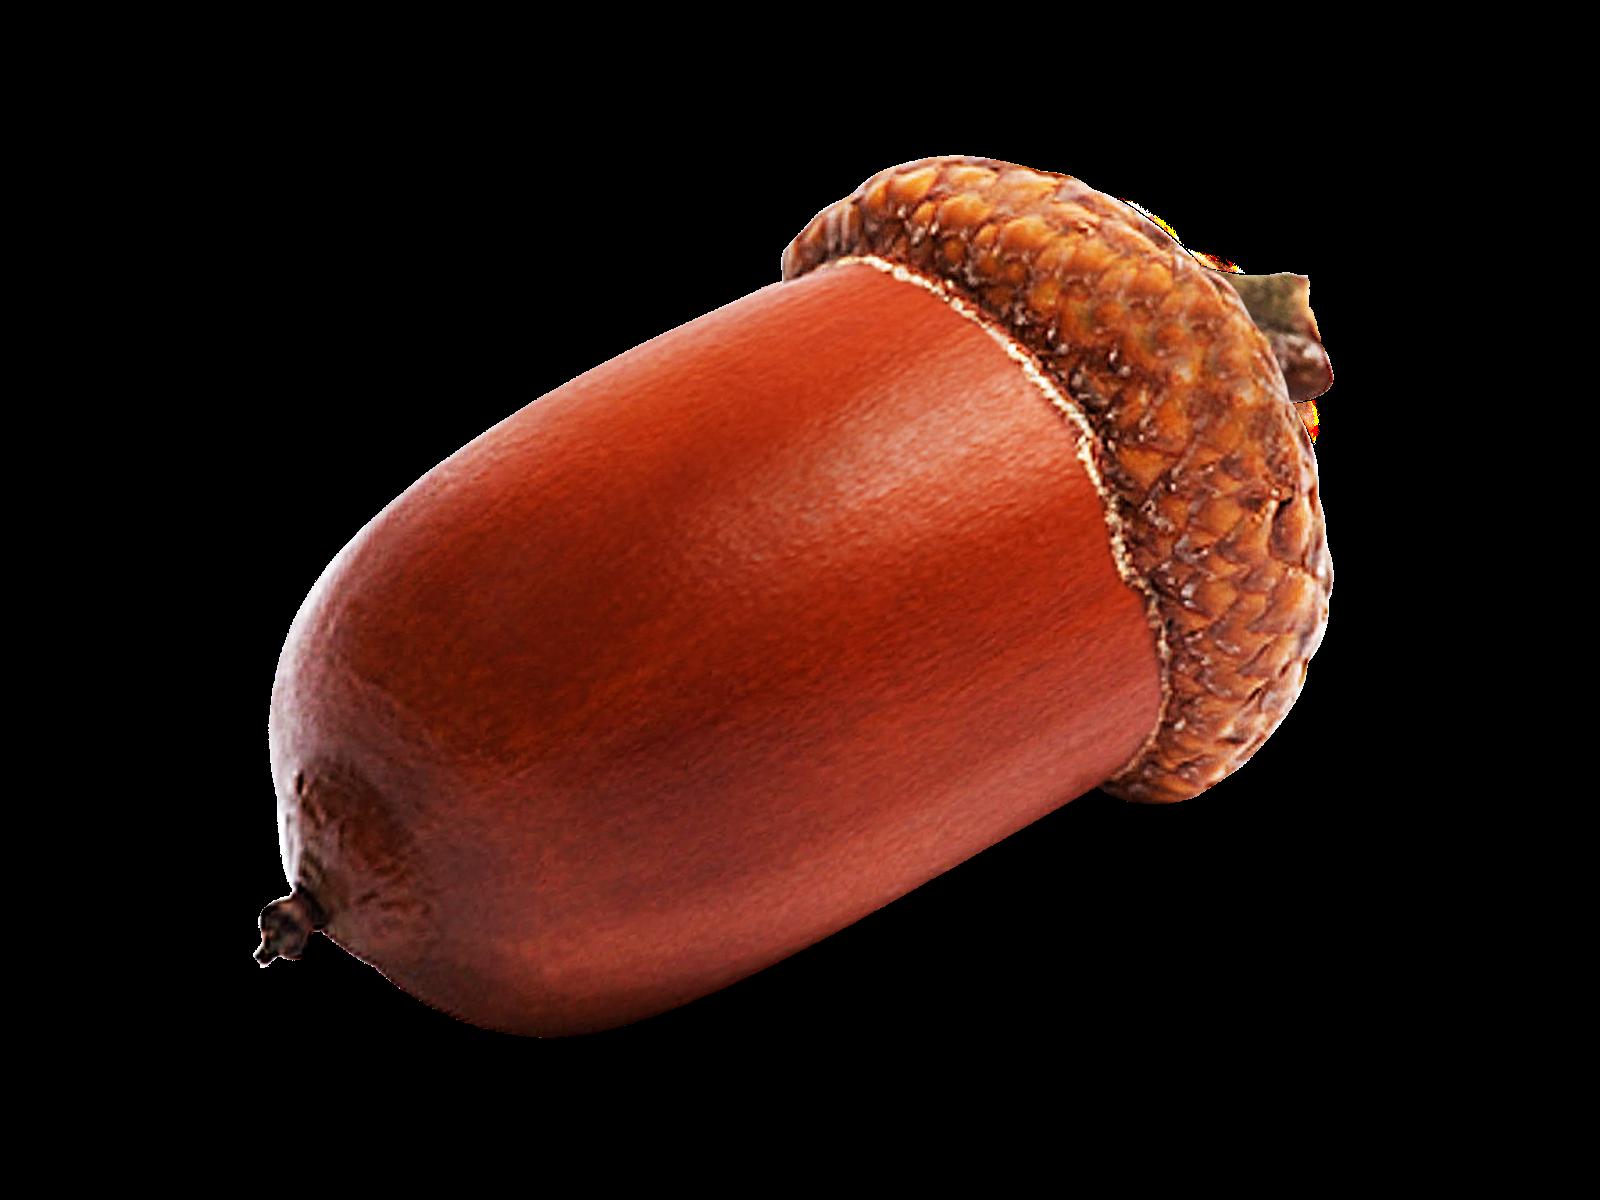 Acorn PNG Image.